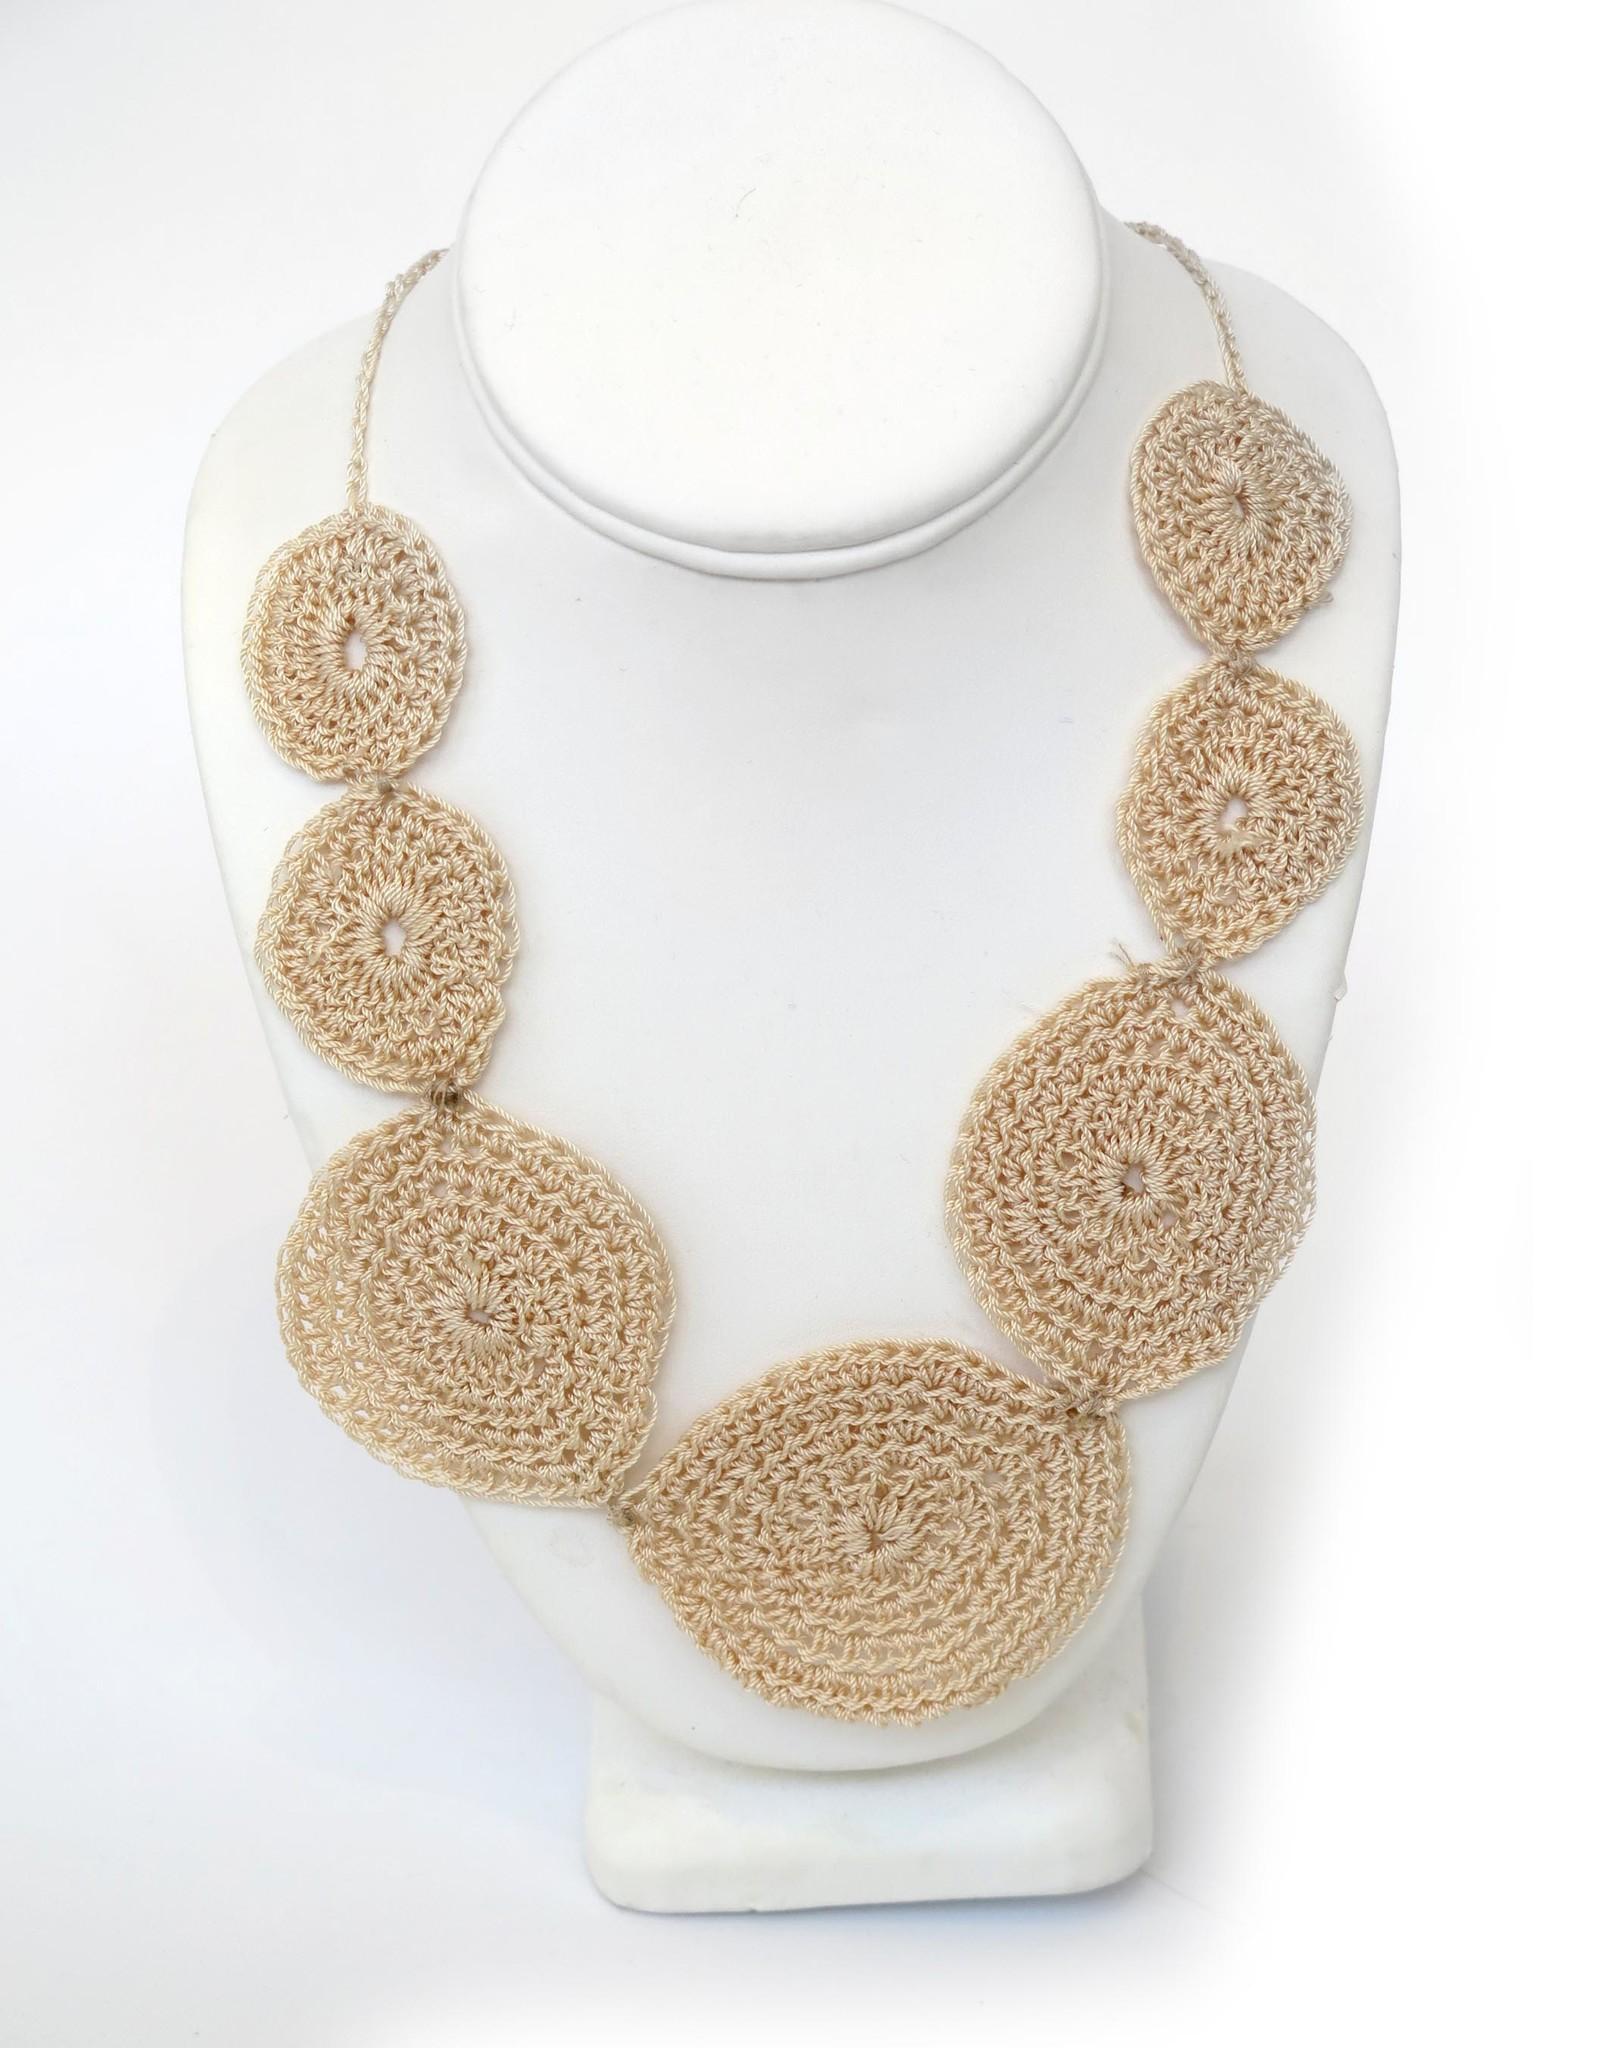 Juicey Gems Cream Juicey Knit Necklace by Juicy Gems